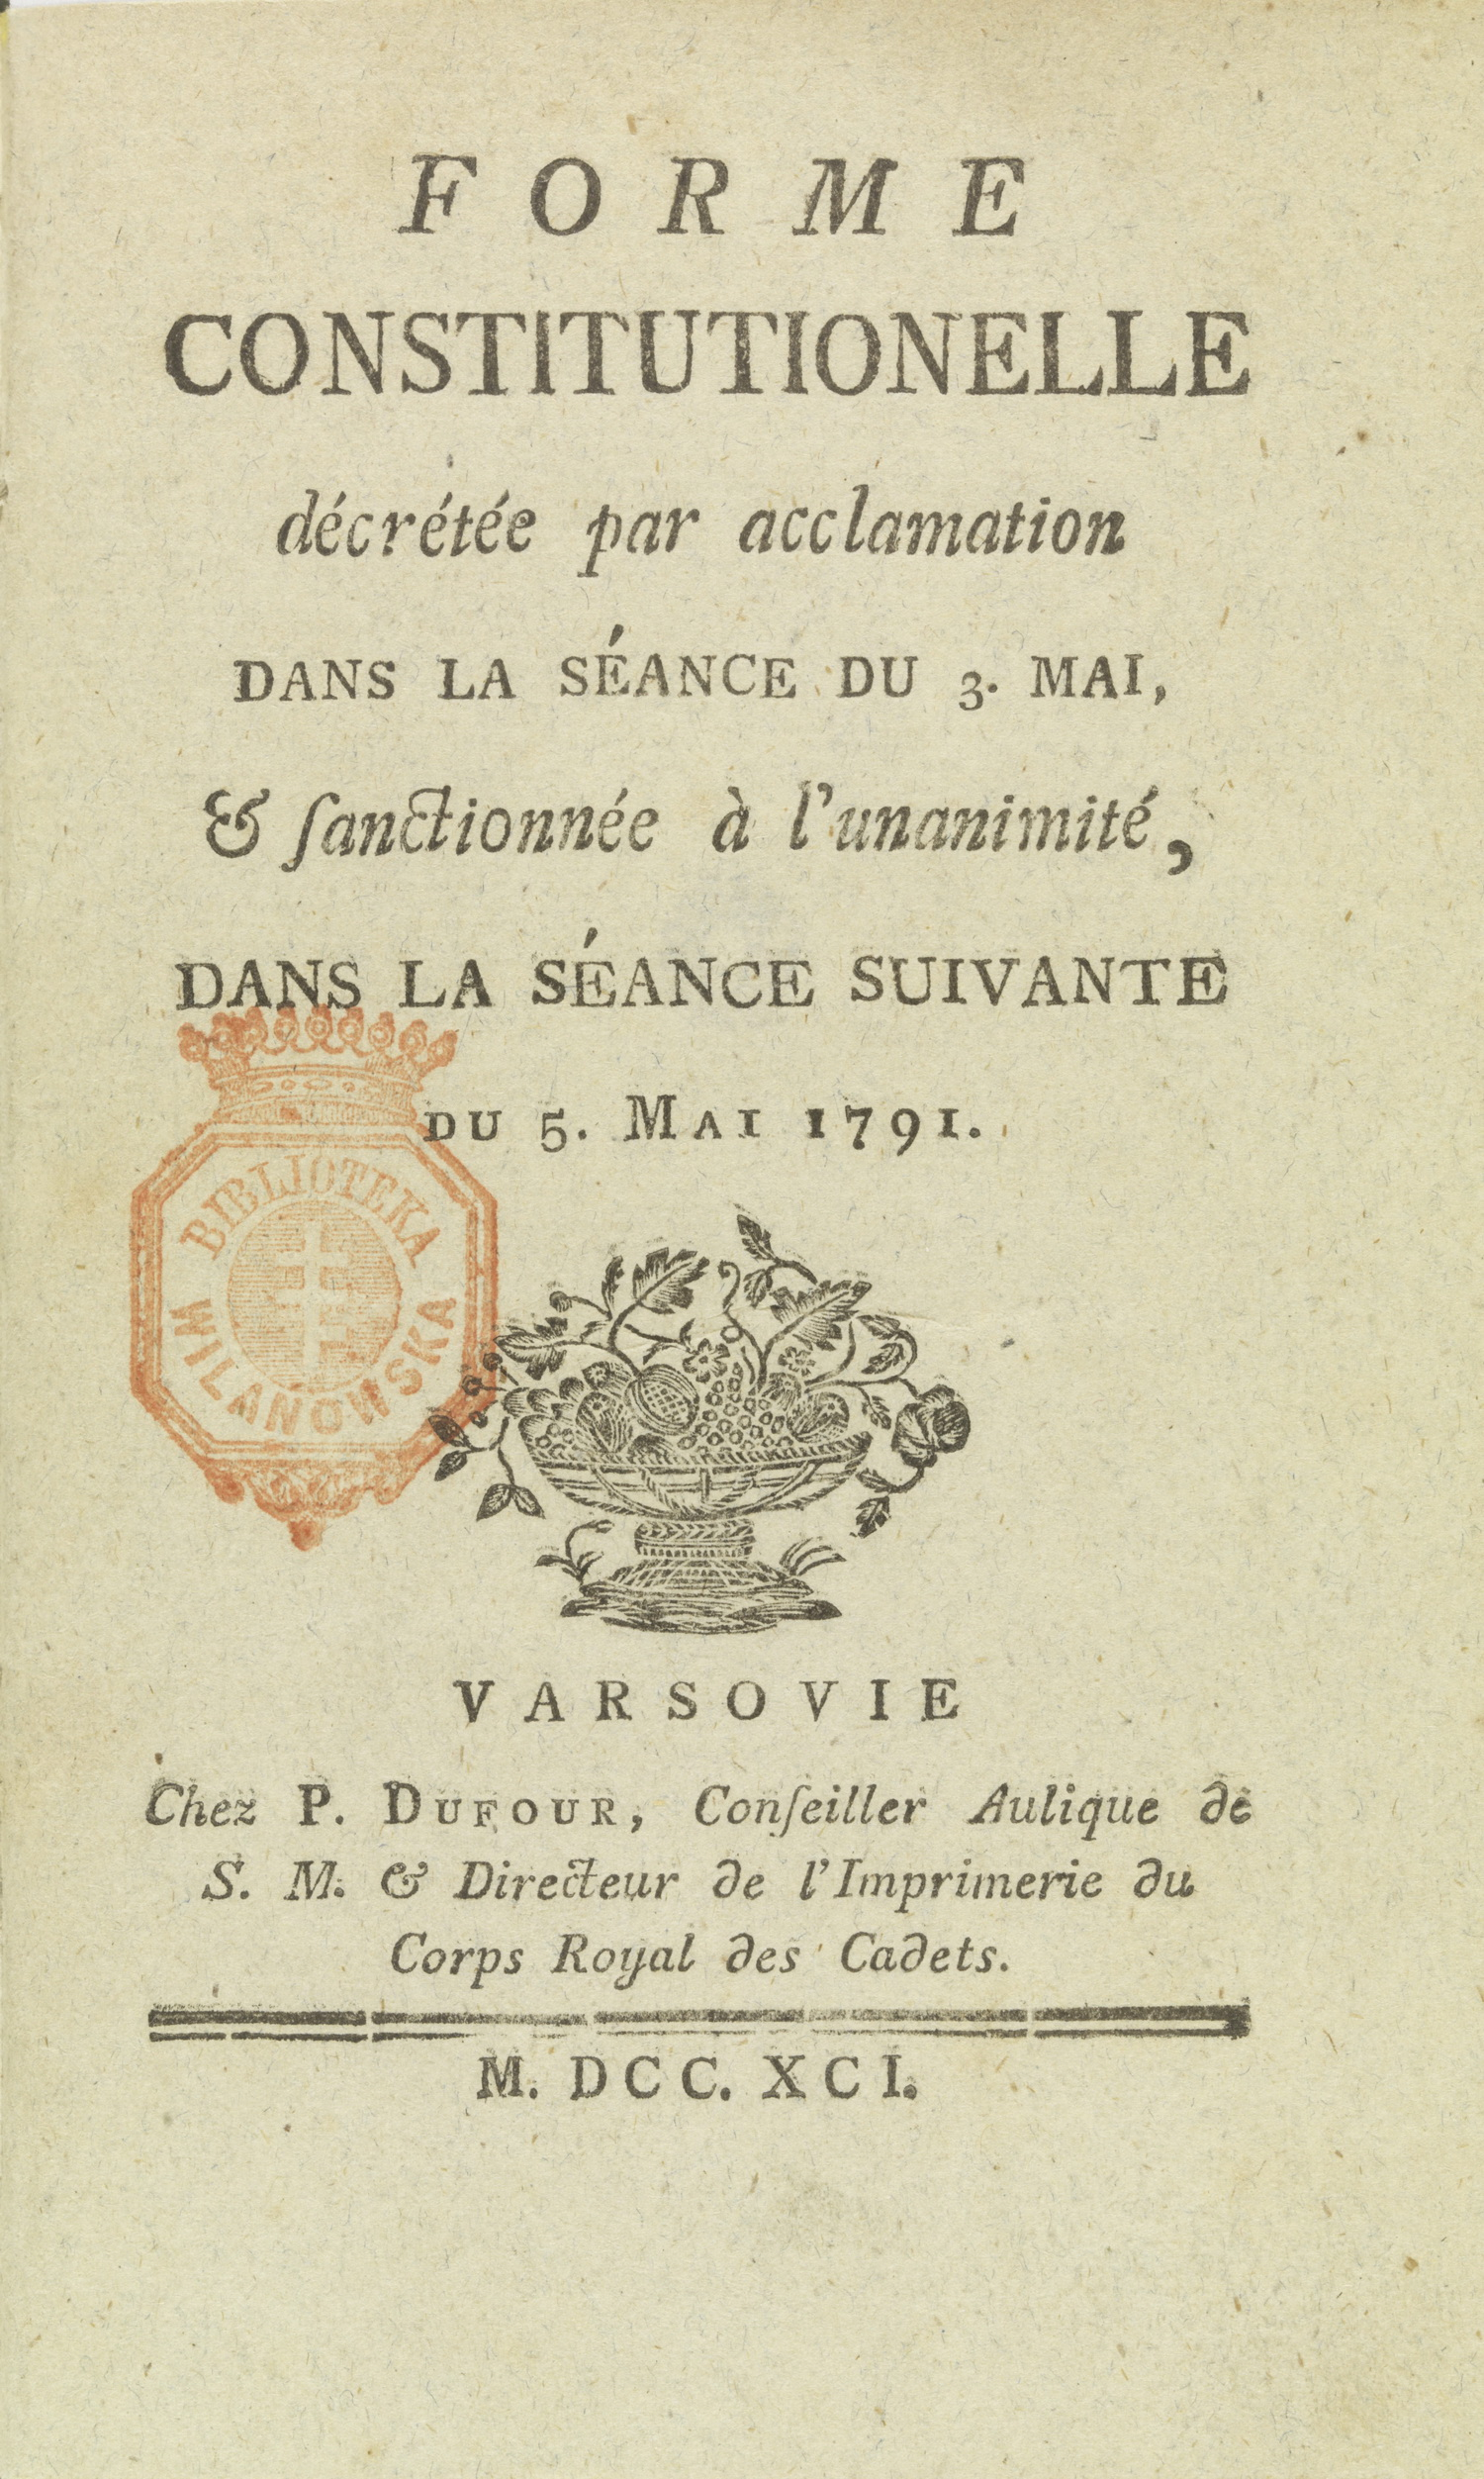 https://upload.wikimedia.org/wikipedia/commons/e/ef/Forme_constitutionelle_de_la_Pologne_-_Varsovie_1791_-_Piotr_Dufour.jpg